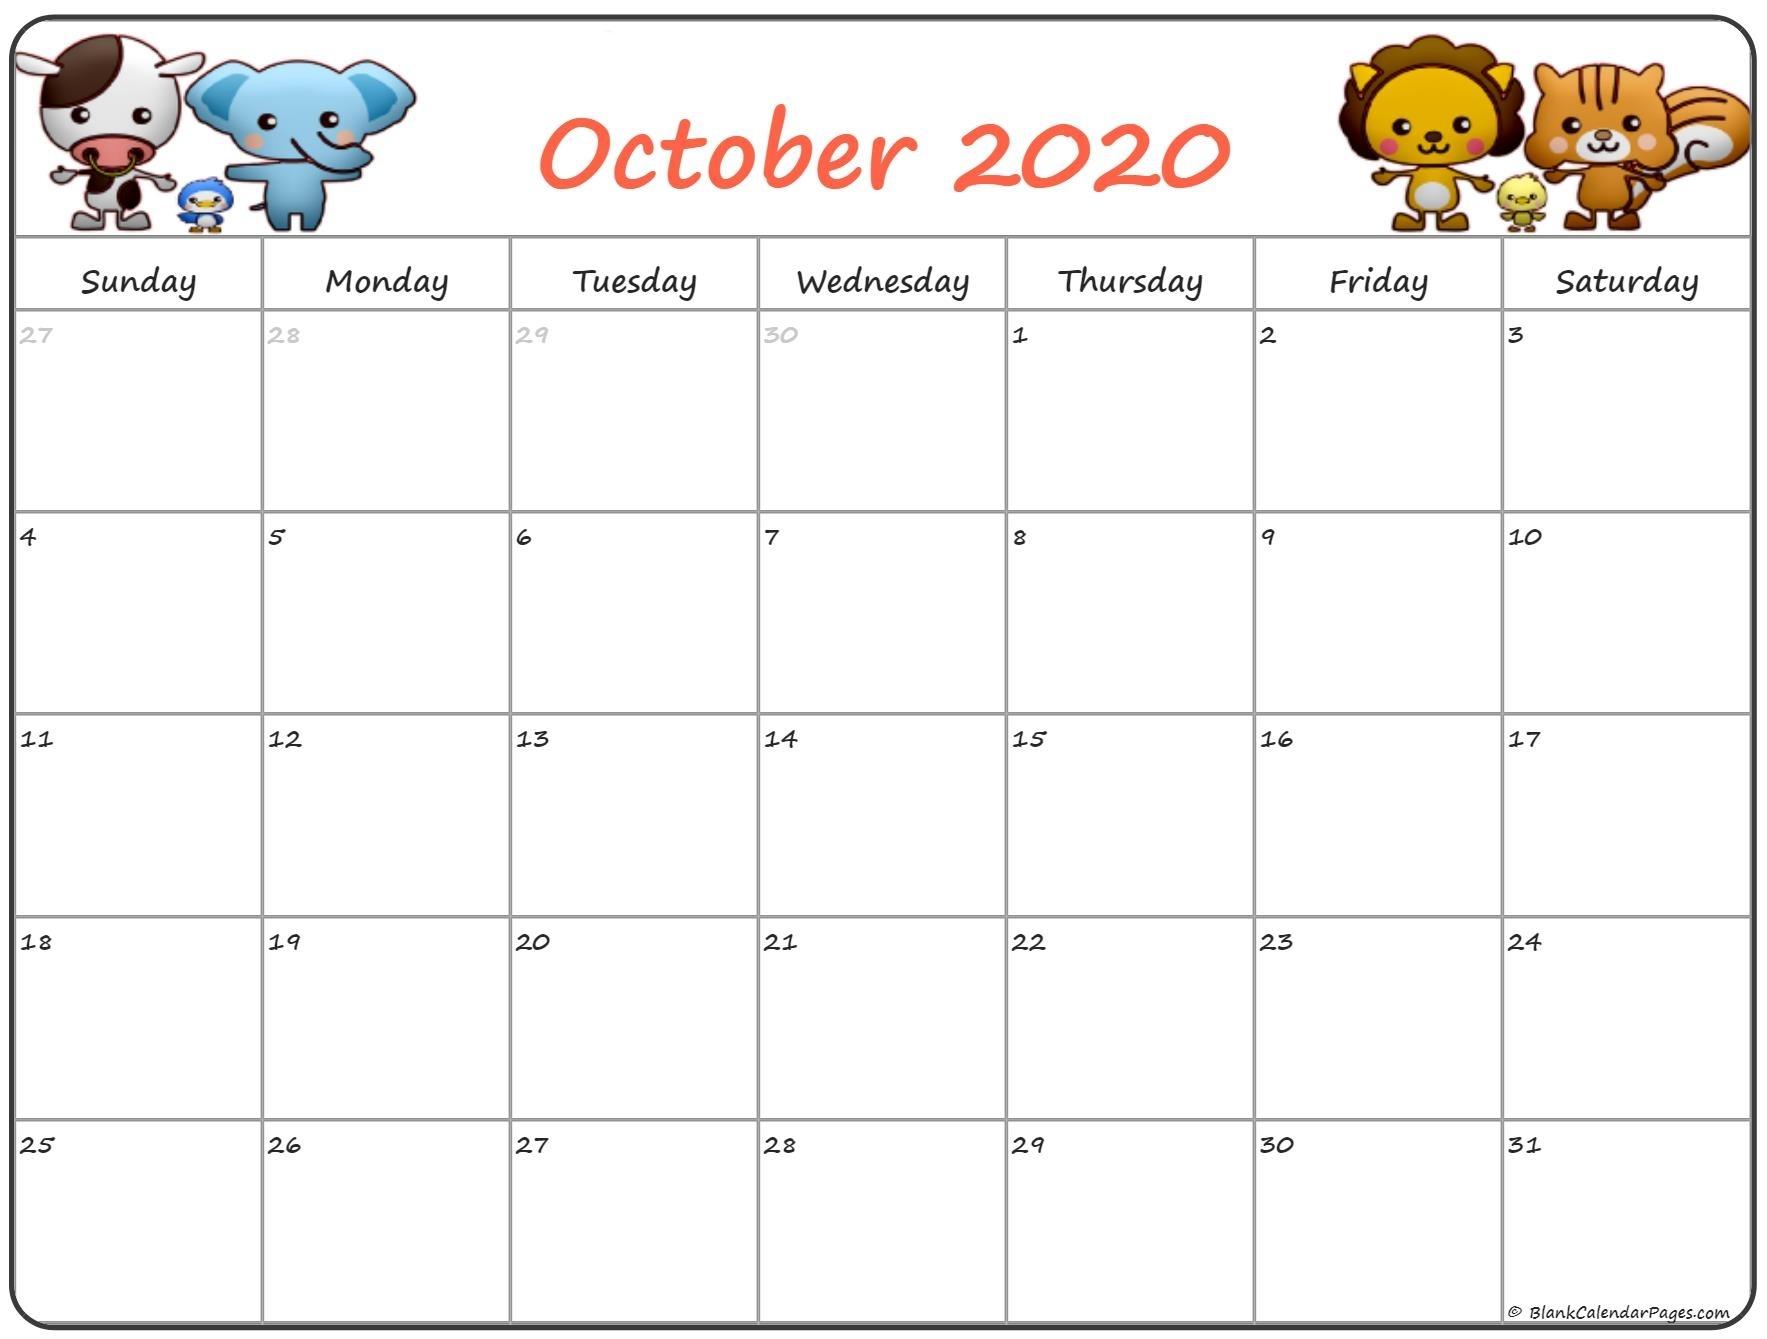 October 2020 Pregnancy Calendar | Fertility Calendar